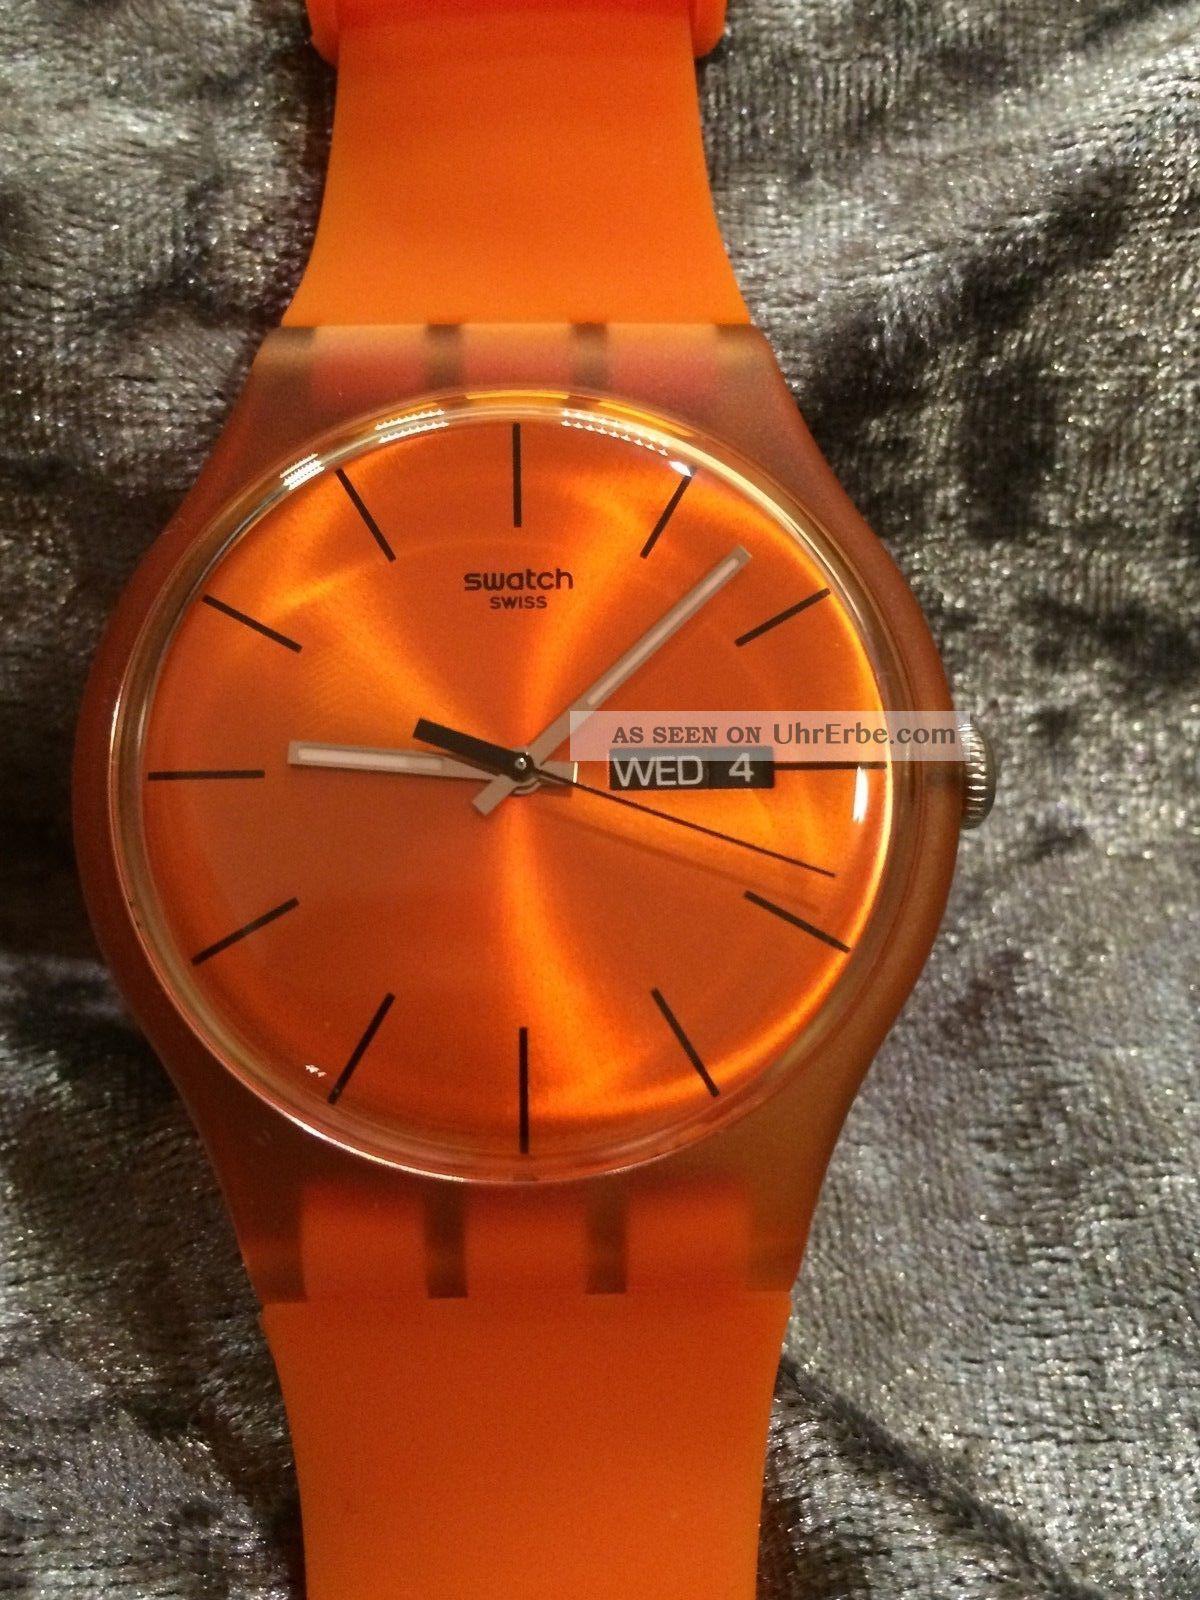 Swatch Gent Pumpkin Rebel Suoo700 Ovp Nib Groote Oranje,  Orange Und Heiß Armbanduhren Bild